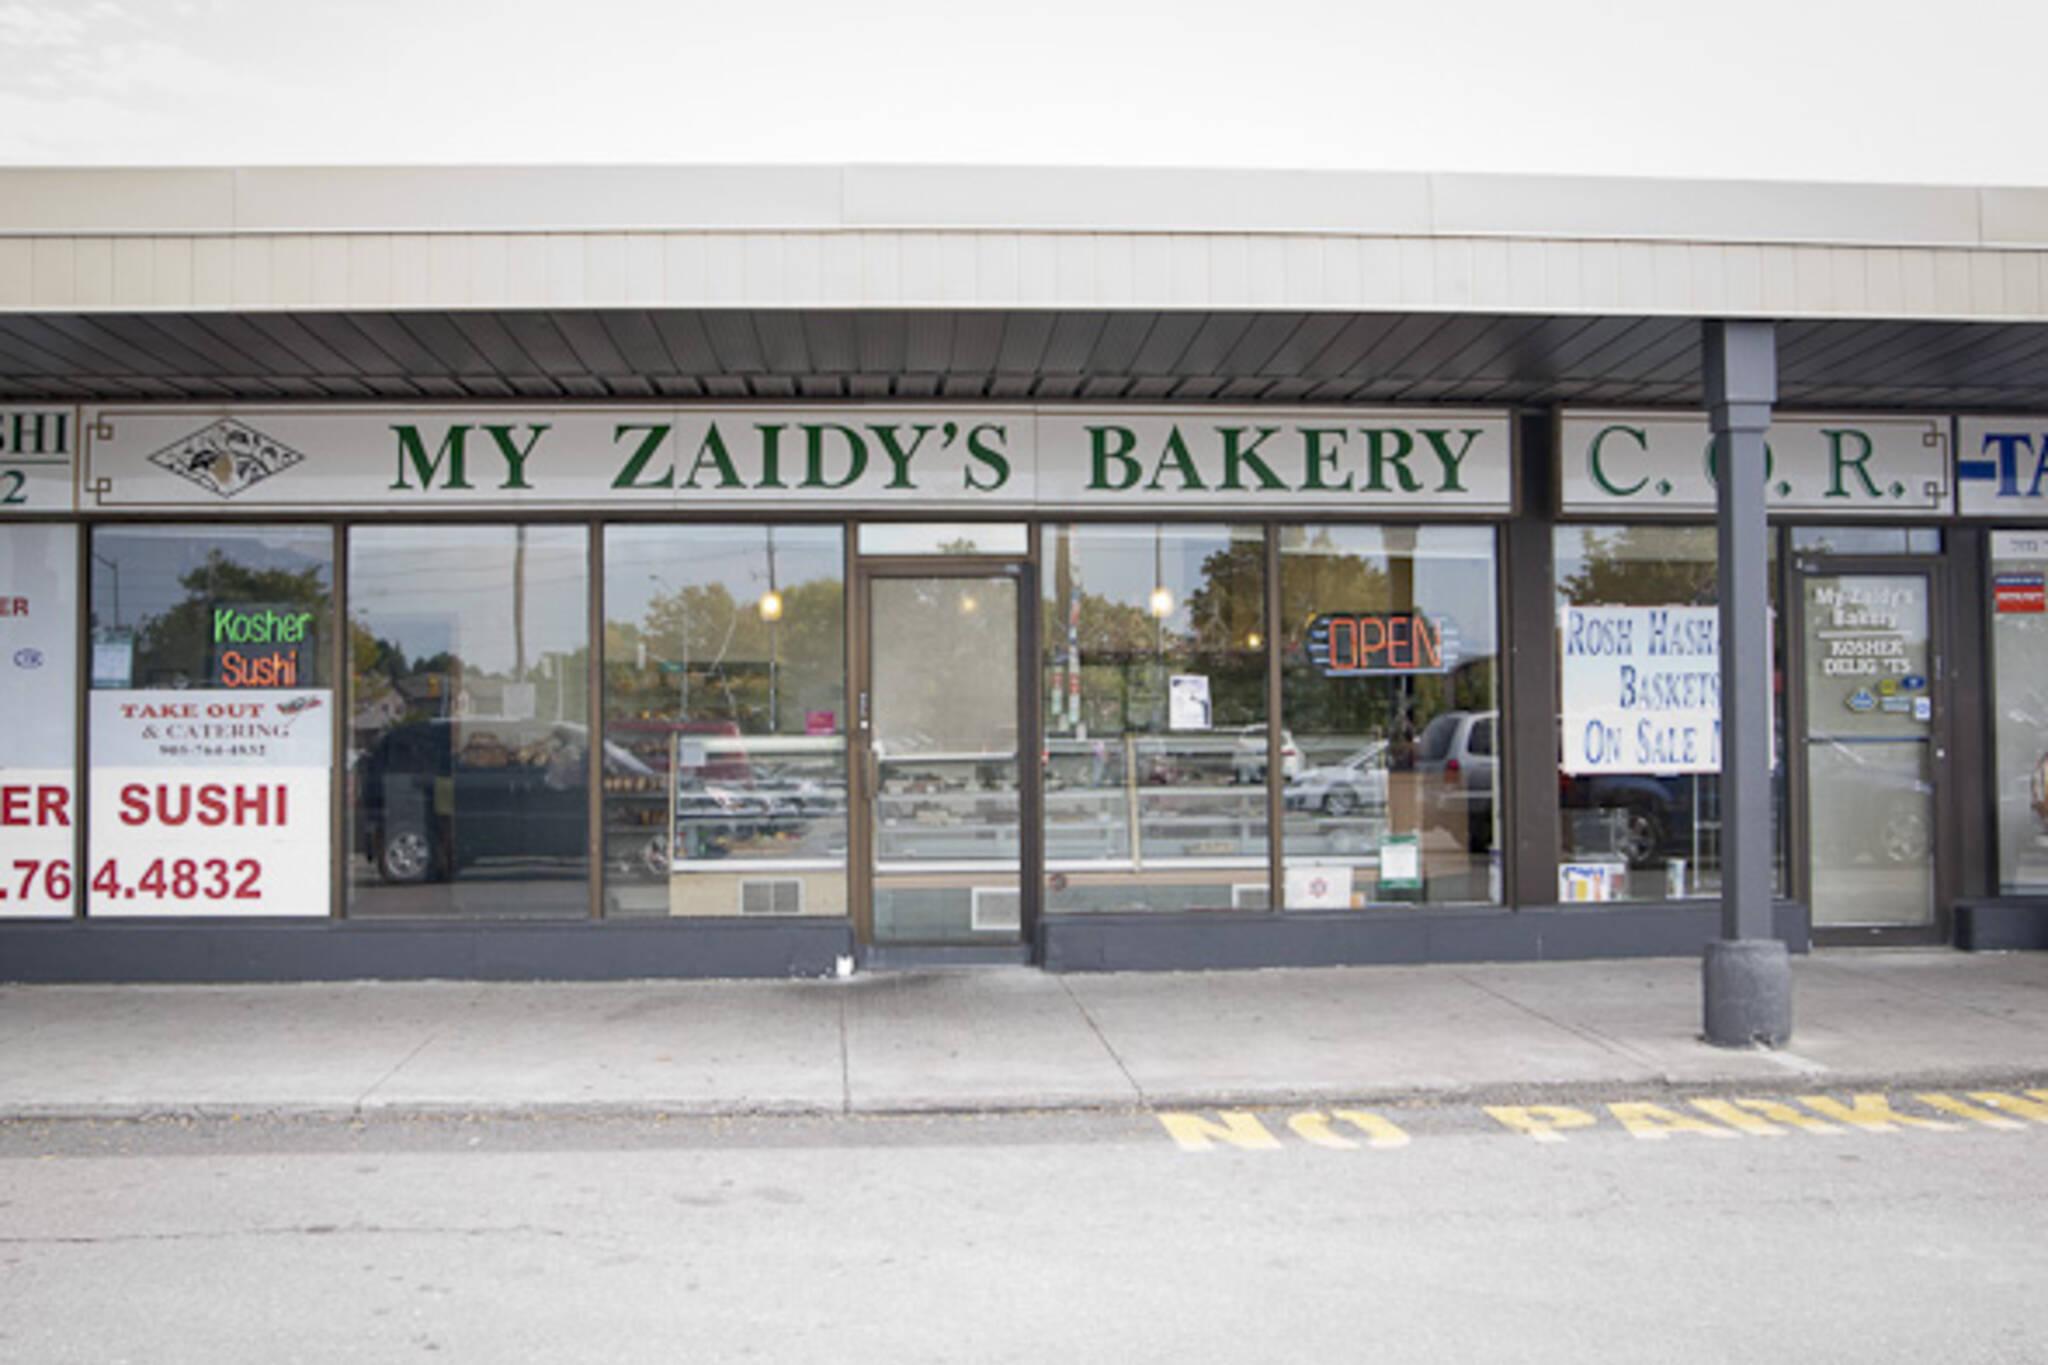 My Zaidy's Bakery